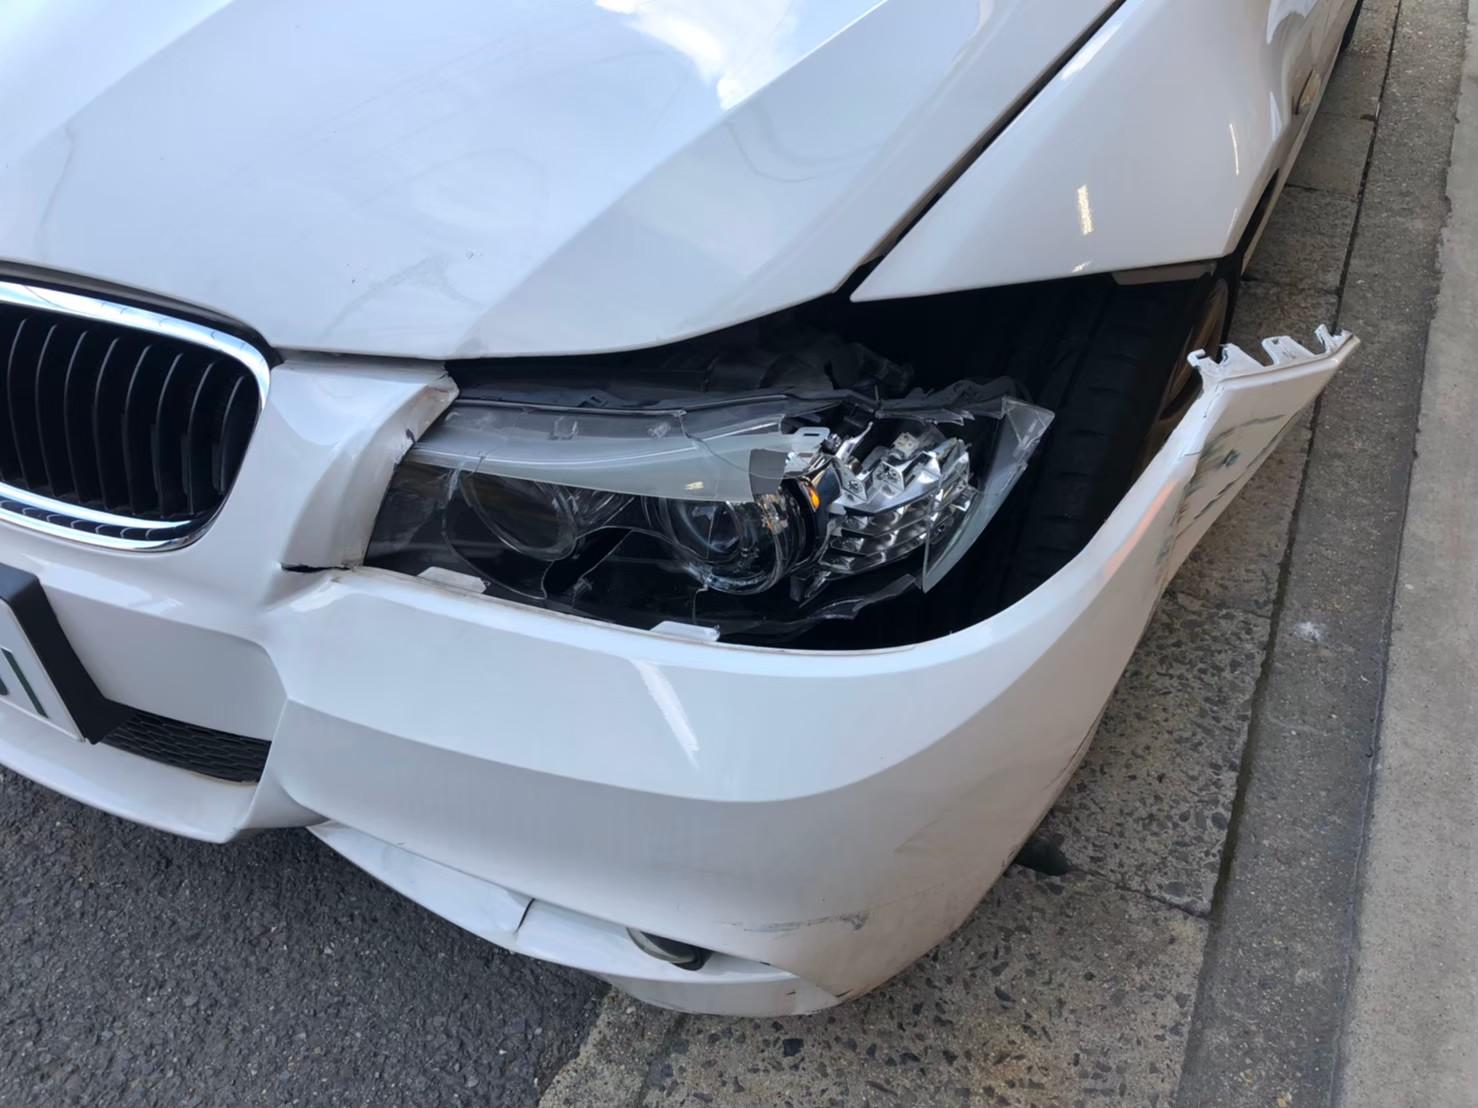 BMW 京都市内にお住まいの方より フロントバンパー左前の修理